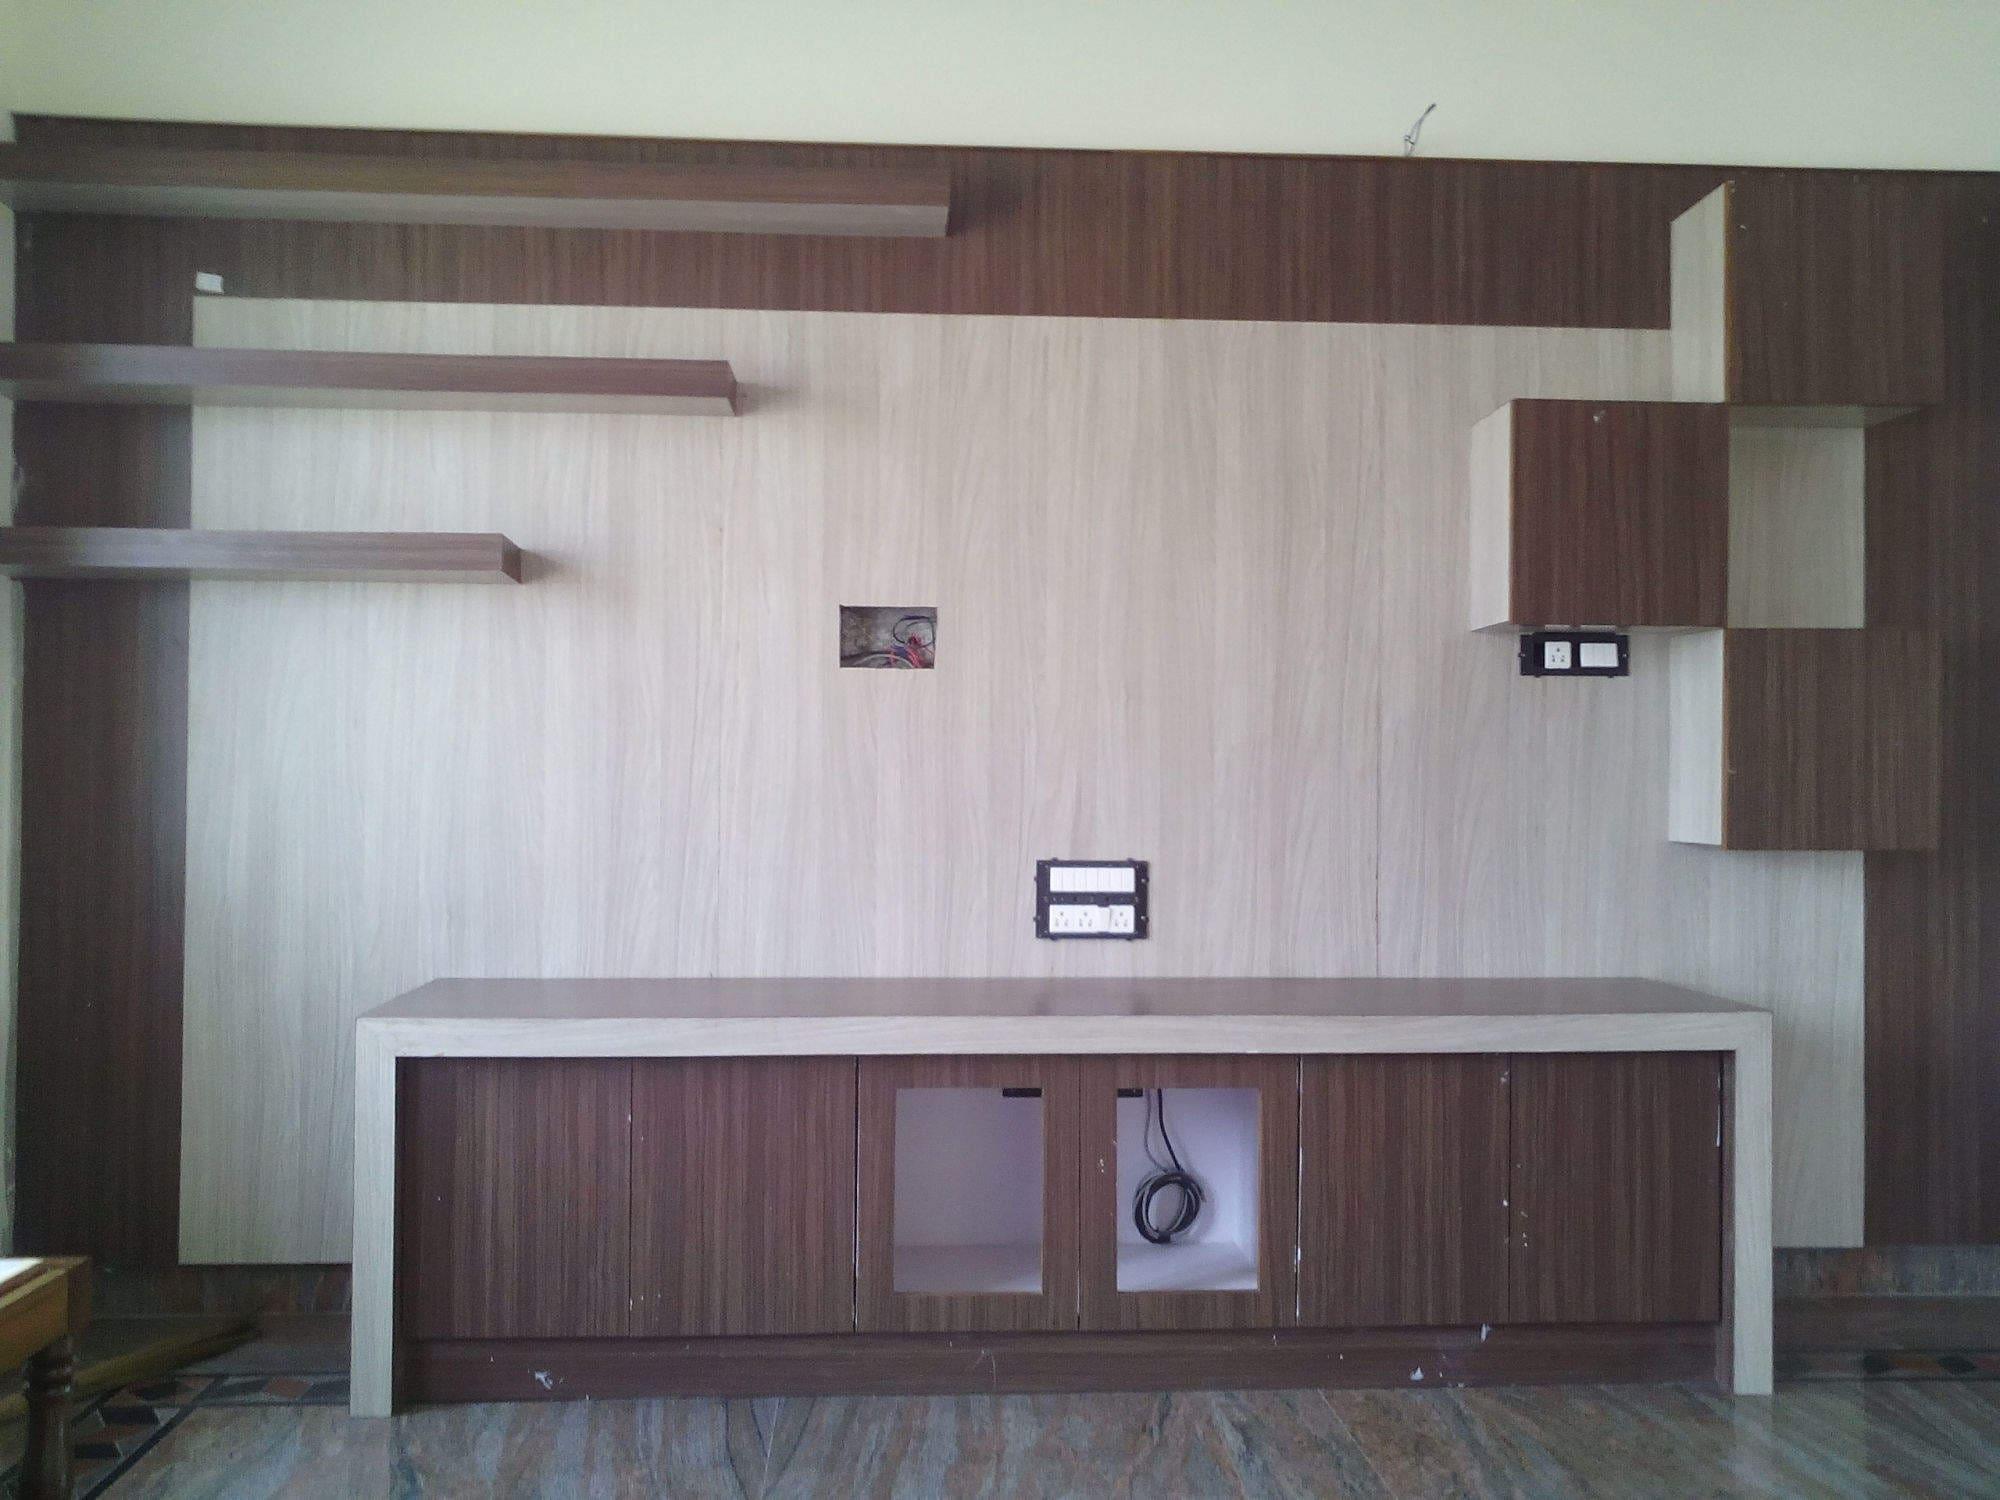 Top 30 Carpenters in Neelasandra, Bangalore - Carpentry